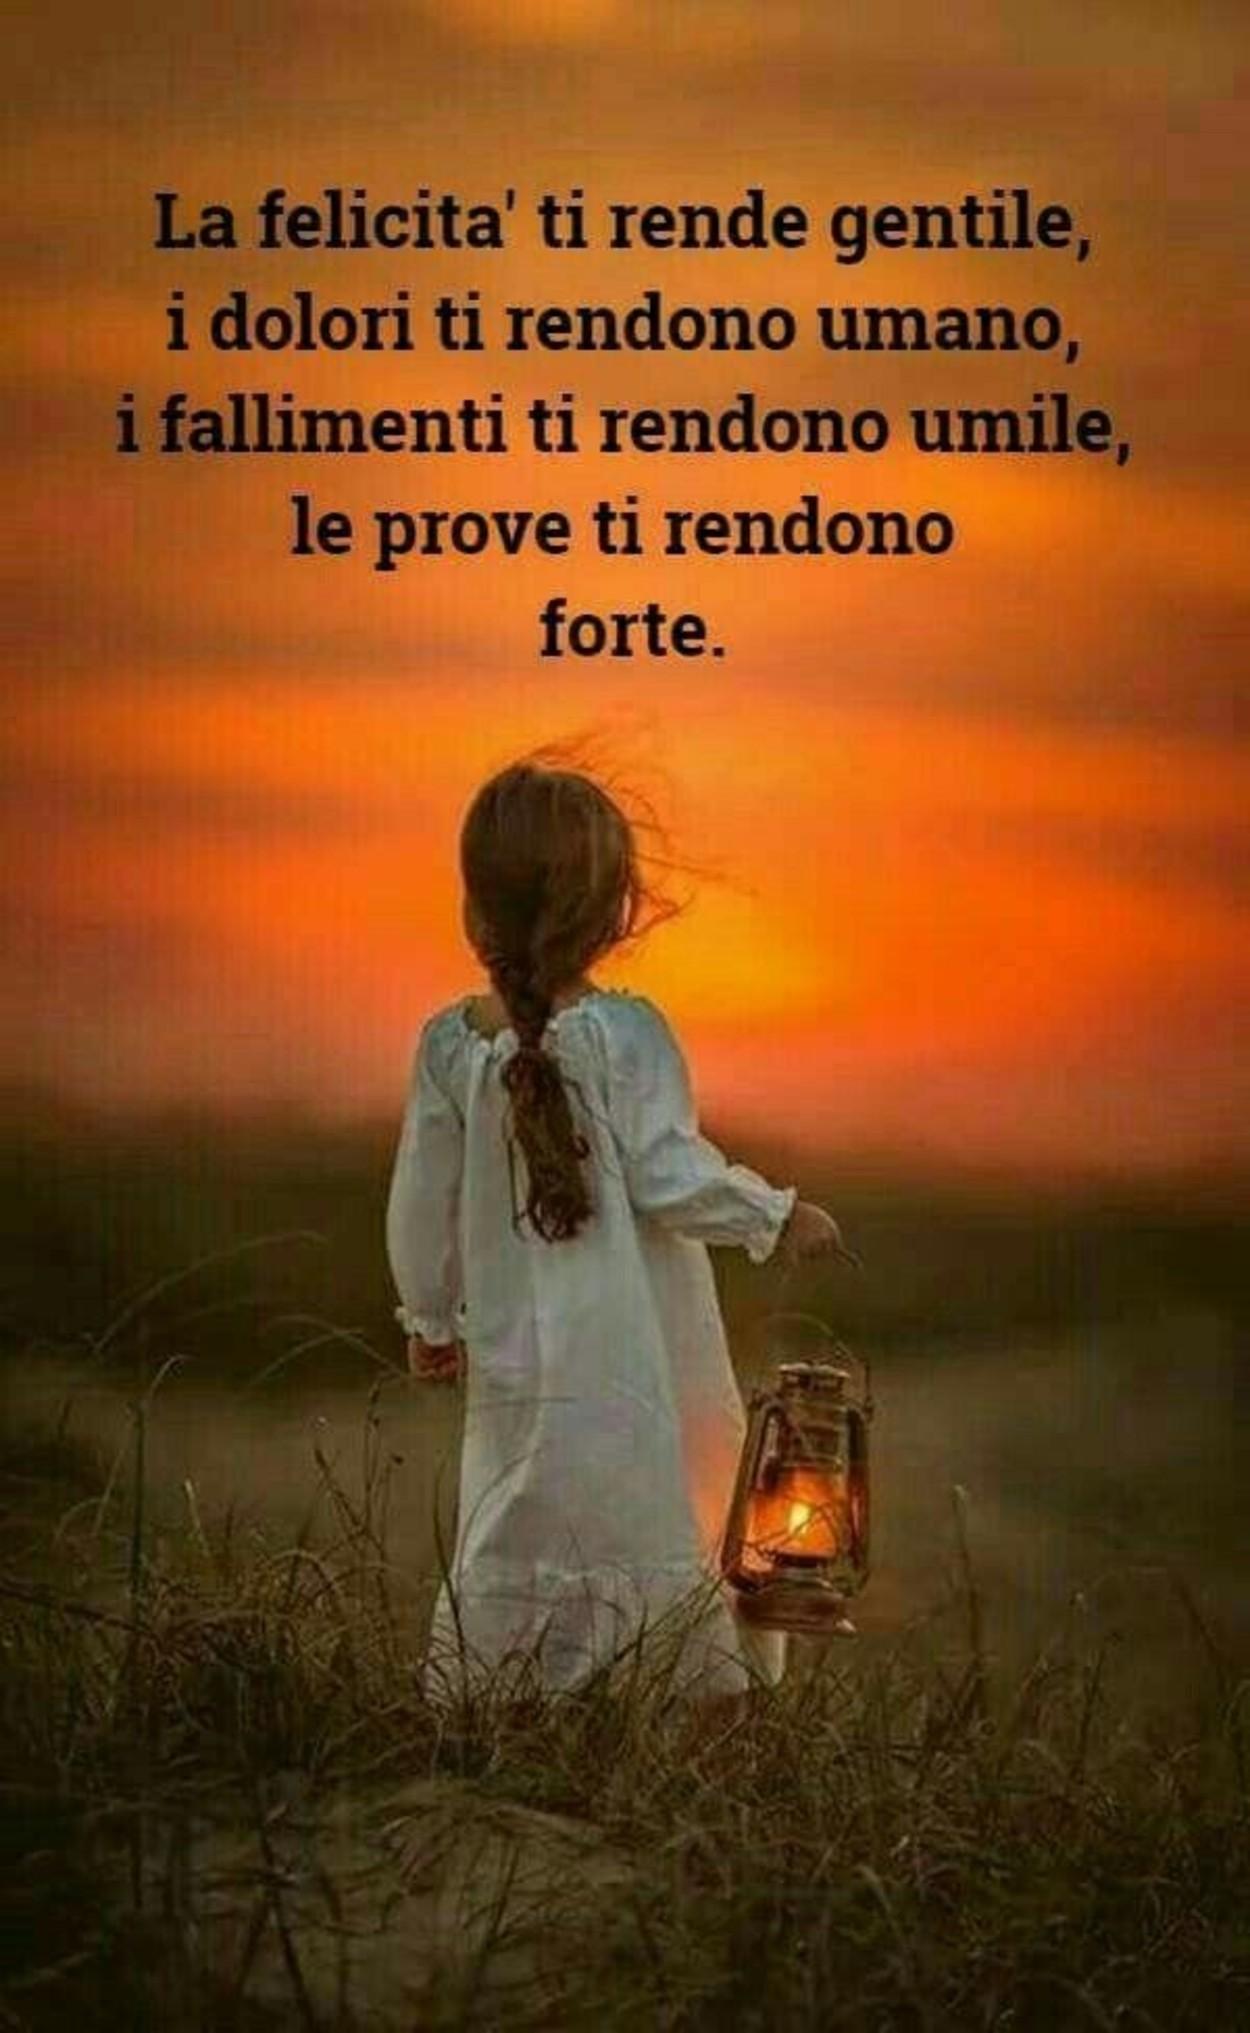 Le Piu Belle Frasi 3339 Immaginifacebook It